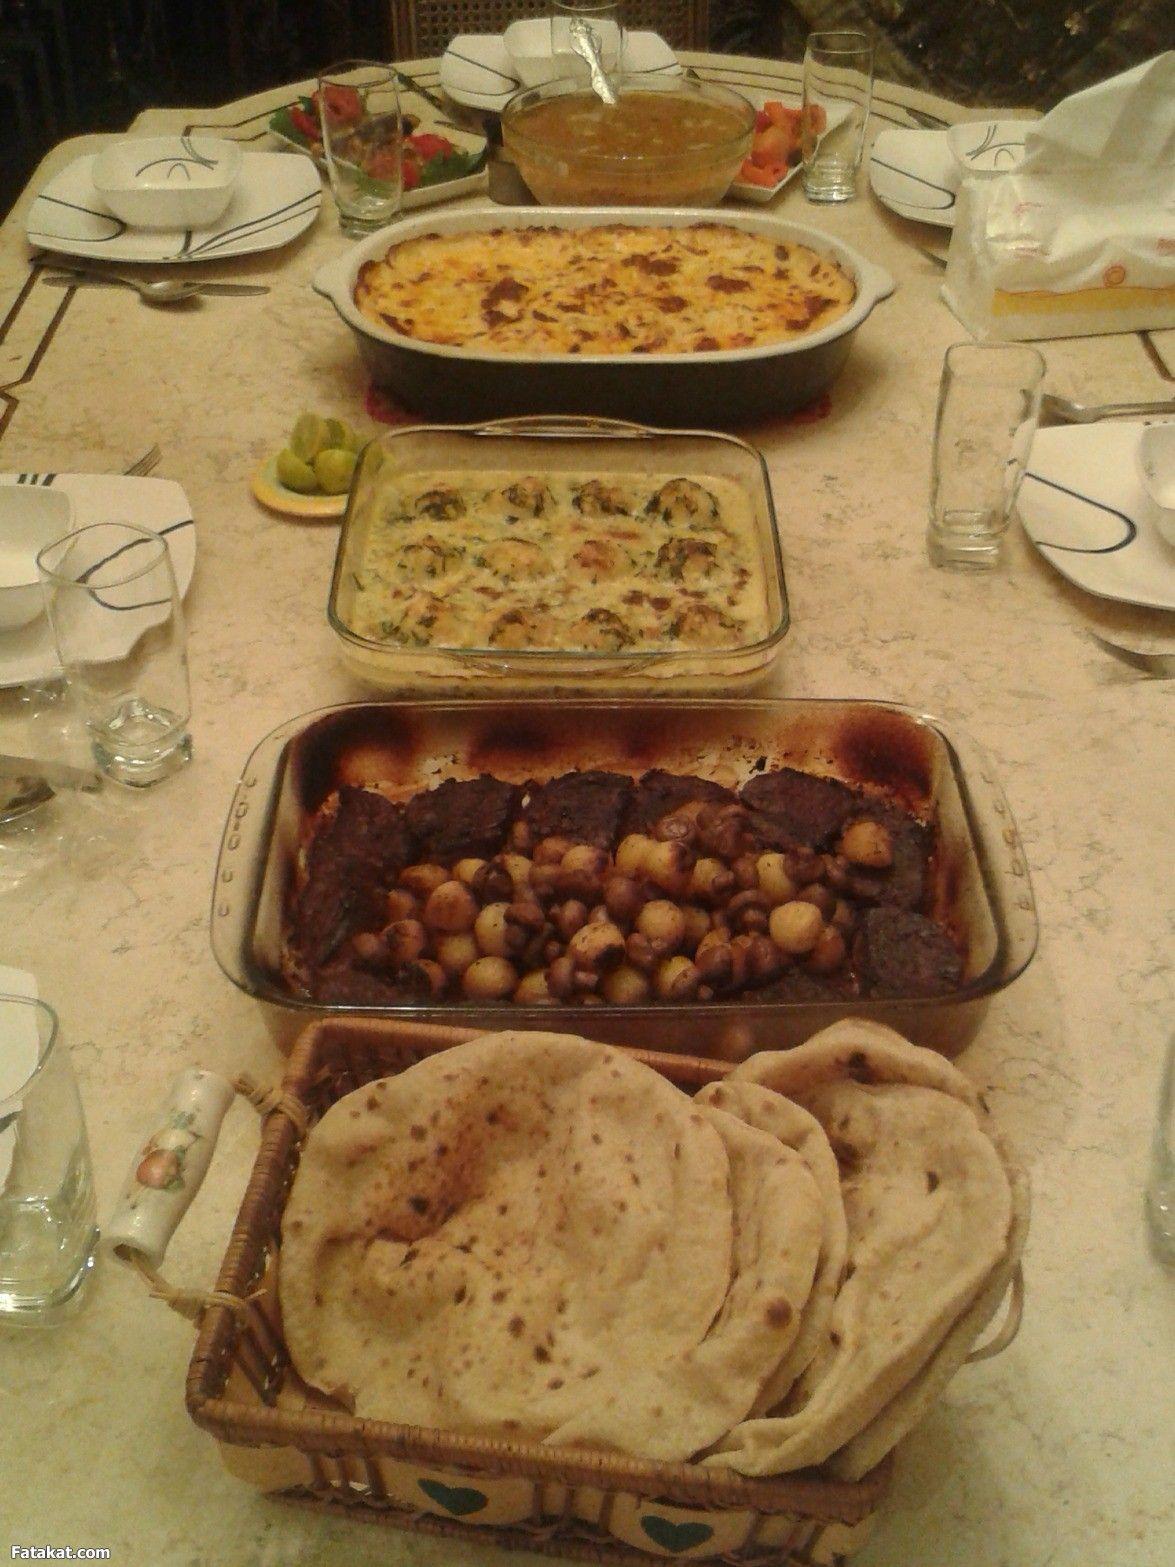 عزومة تانى يوم رمضان منتدى فتكات Recipes Food Meat